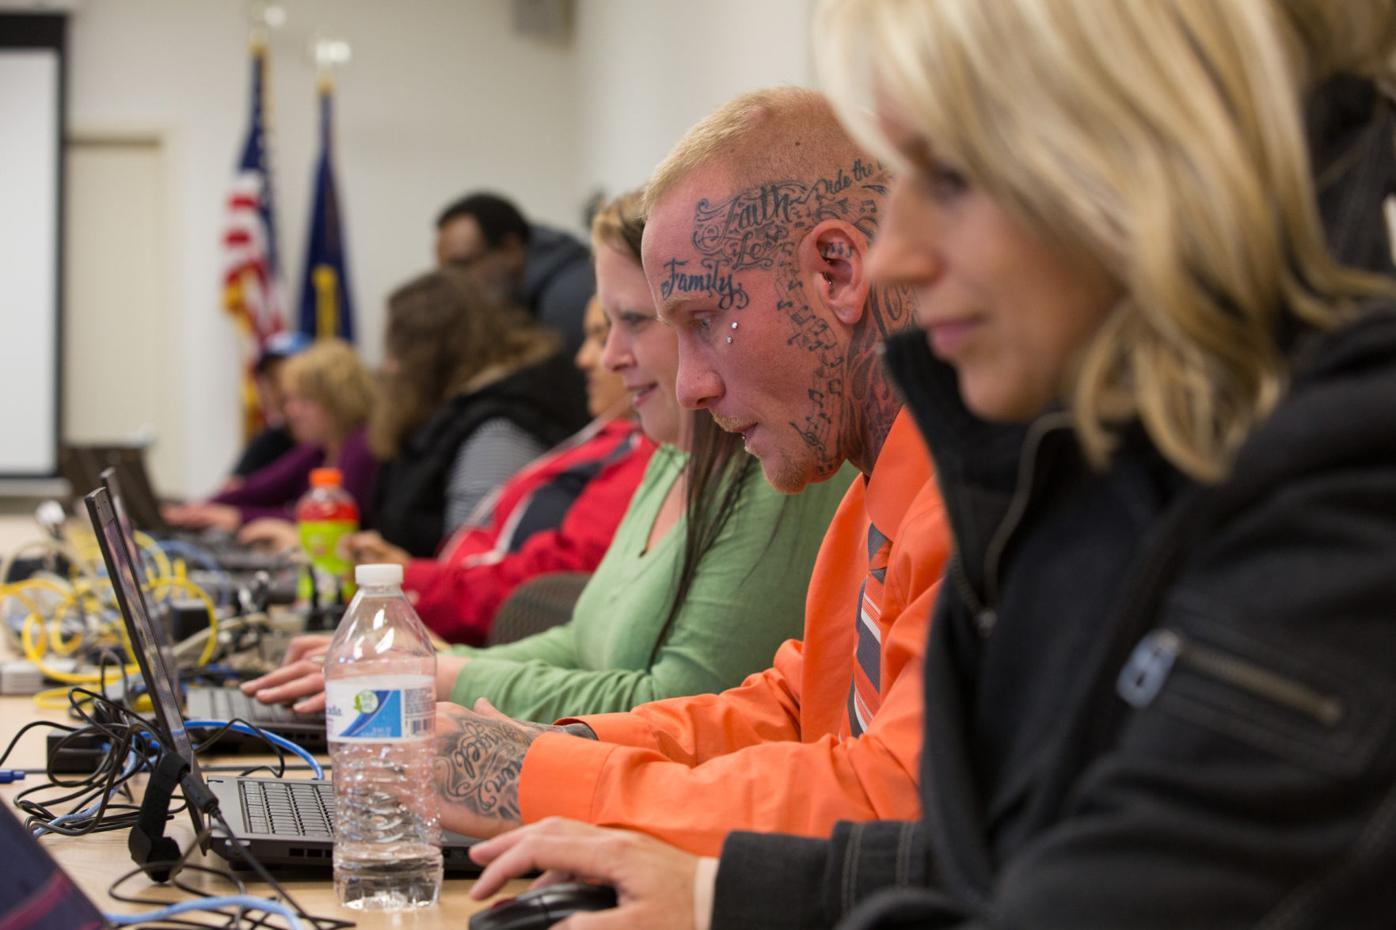 Consumers test Pennsylvania's medical marijuana registry